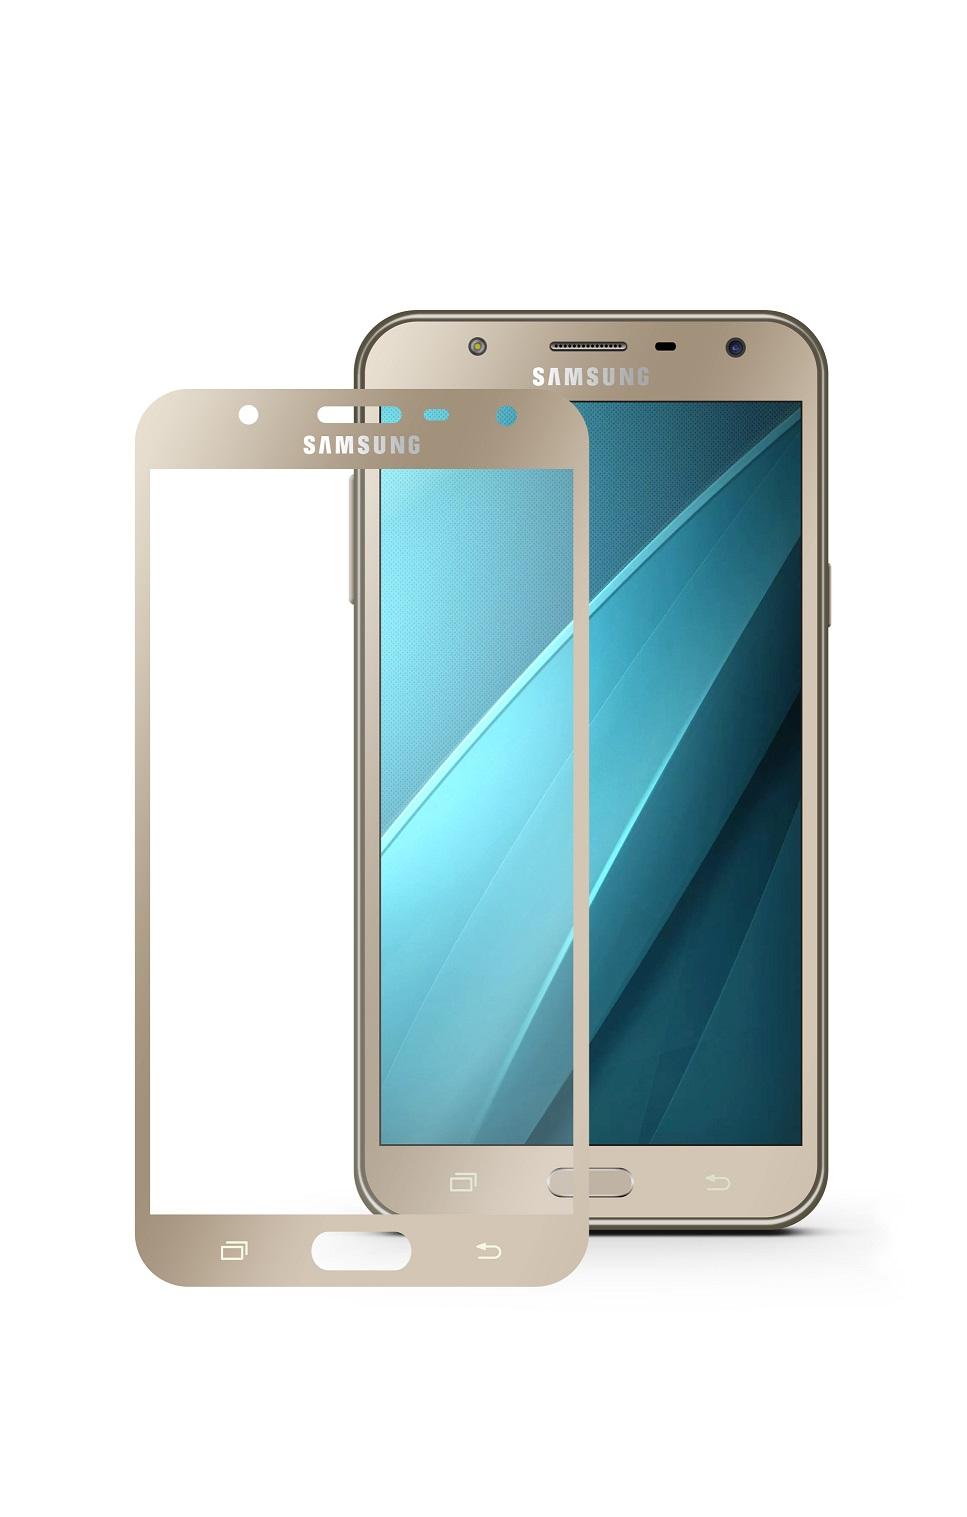 Защитное стекло Mobius Samsung J7 Neo, золотой аксессуар защитное стекло для samsung galaxy j7 2017 mobius 3d full cover black